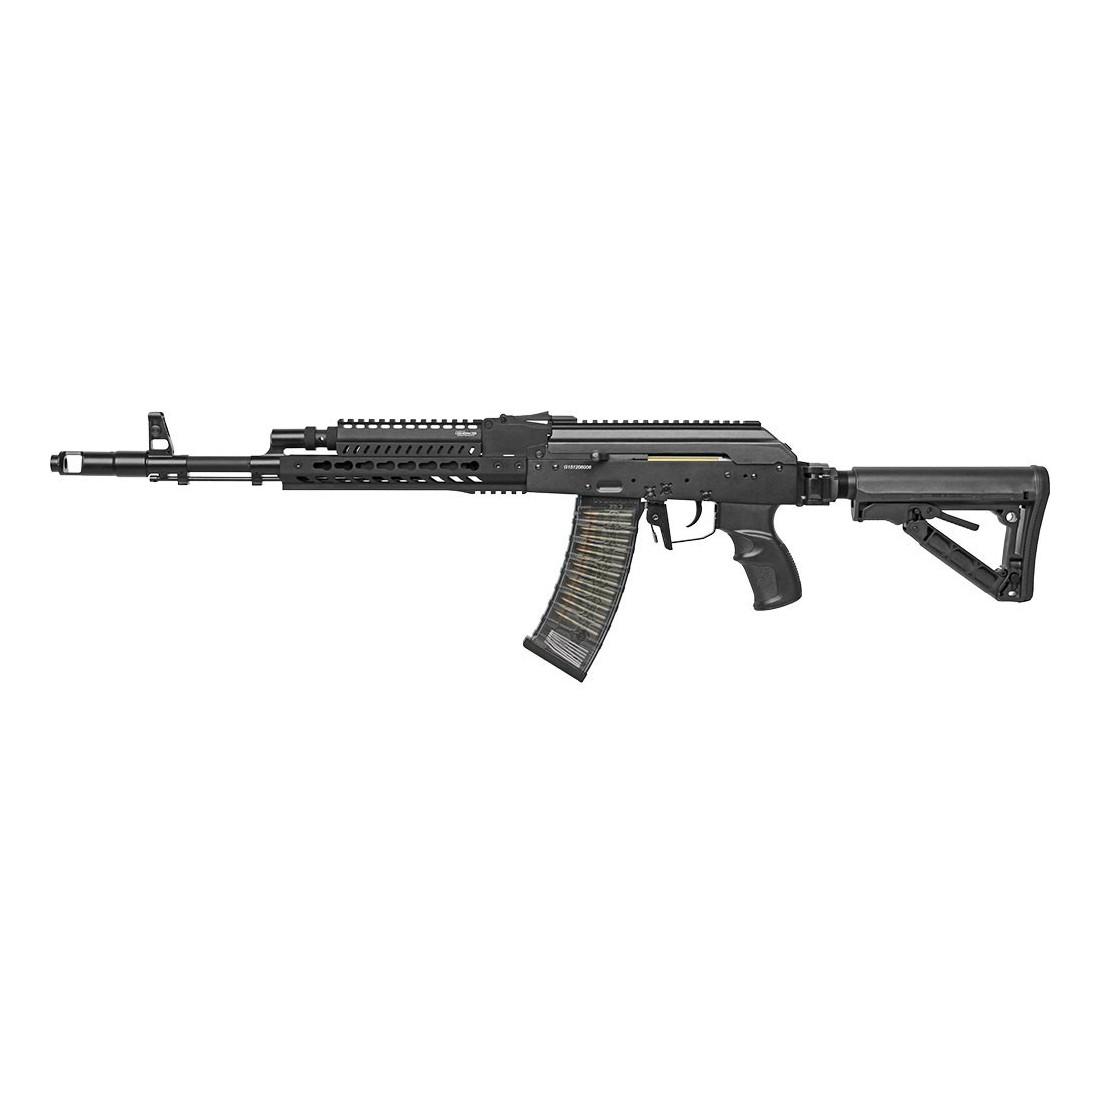 AEG RK74-T bk (GRK-74T-ETU-BNB-NCM) [G&G]